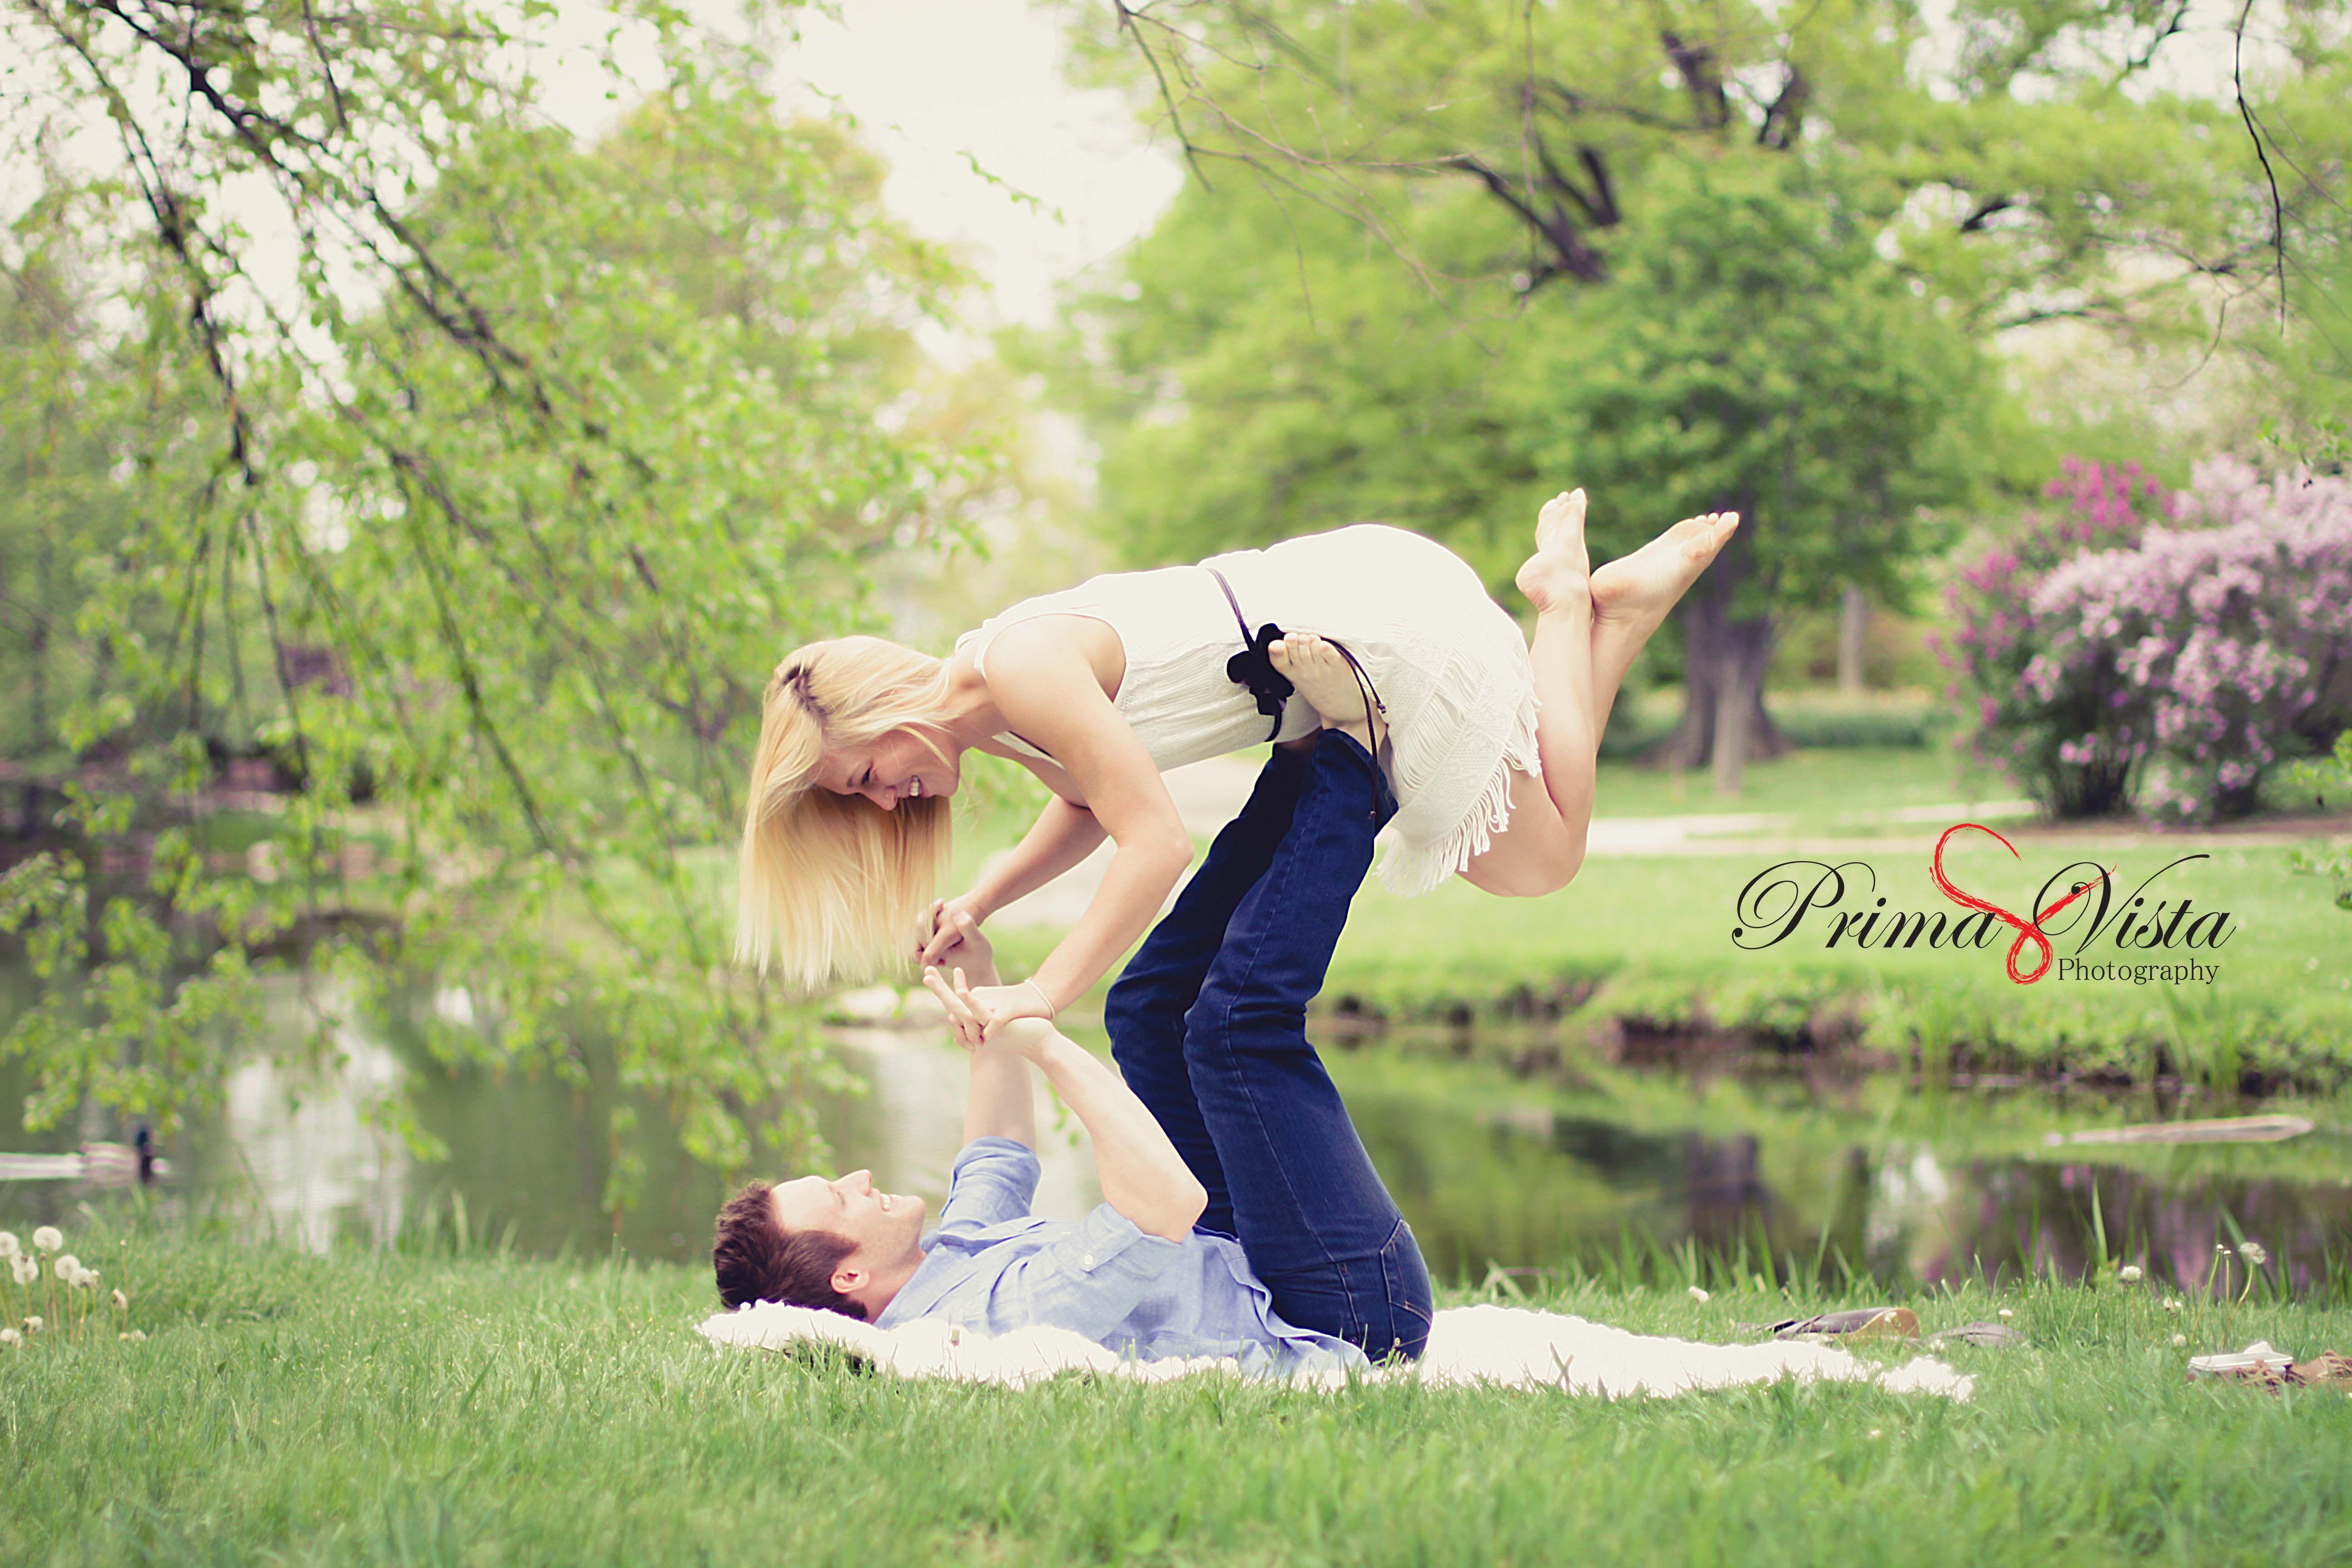 Engagement, Photo Idea, Couple, Blanket, Fun, Poses. Www